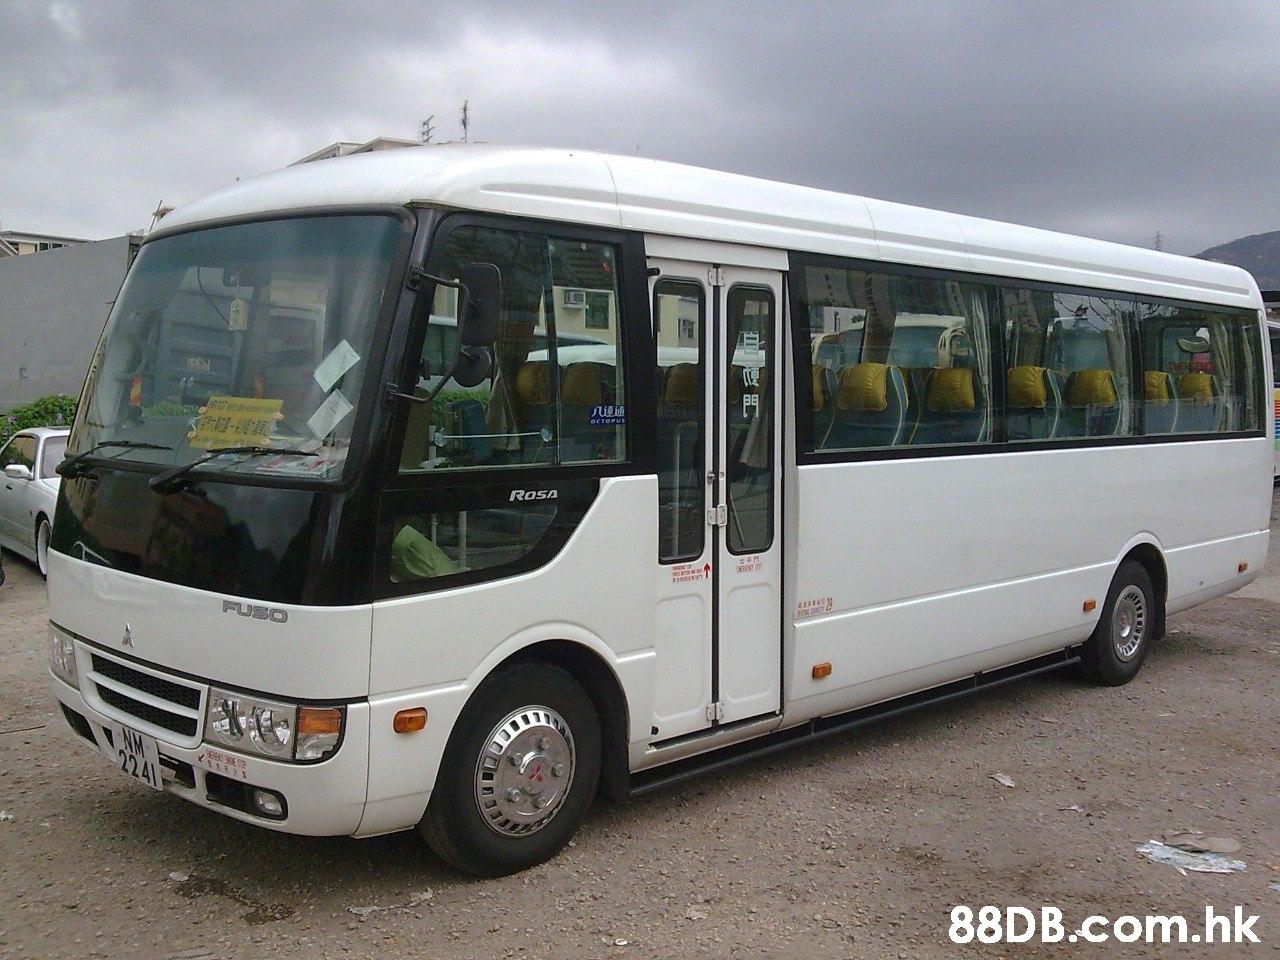 ROSA FUSO .hk  Land vehicle,Bus,Vehicle,Transport,Mode of transport